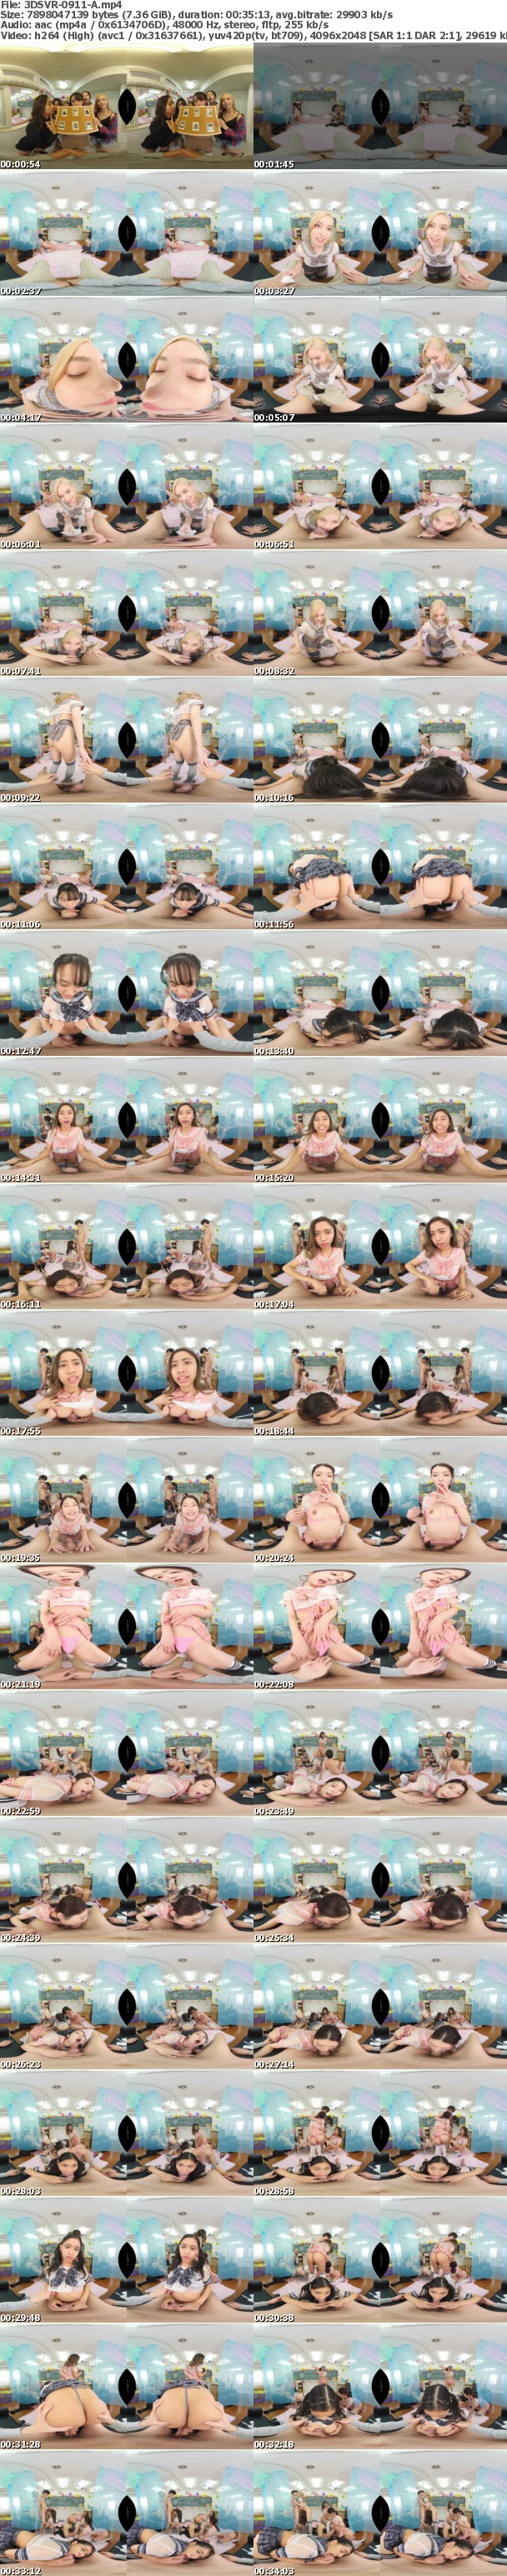 (VR) 3DSVR-0911 日本語学校1-B文化祭の出し物は【ピンサロ】アメリカから東南アジアまでフェラチオ文化交流 限定特別コース【ハーレムコース】で世界の美人学生を独り占め!